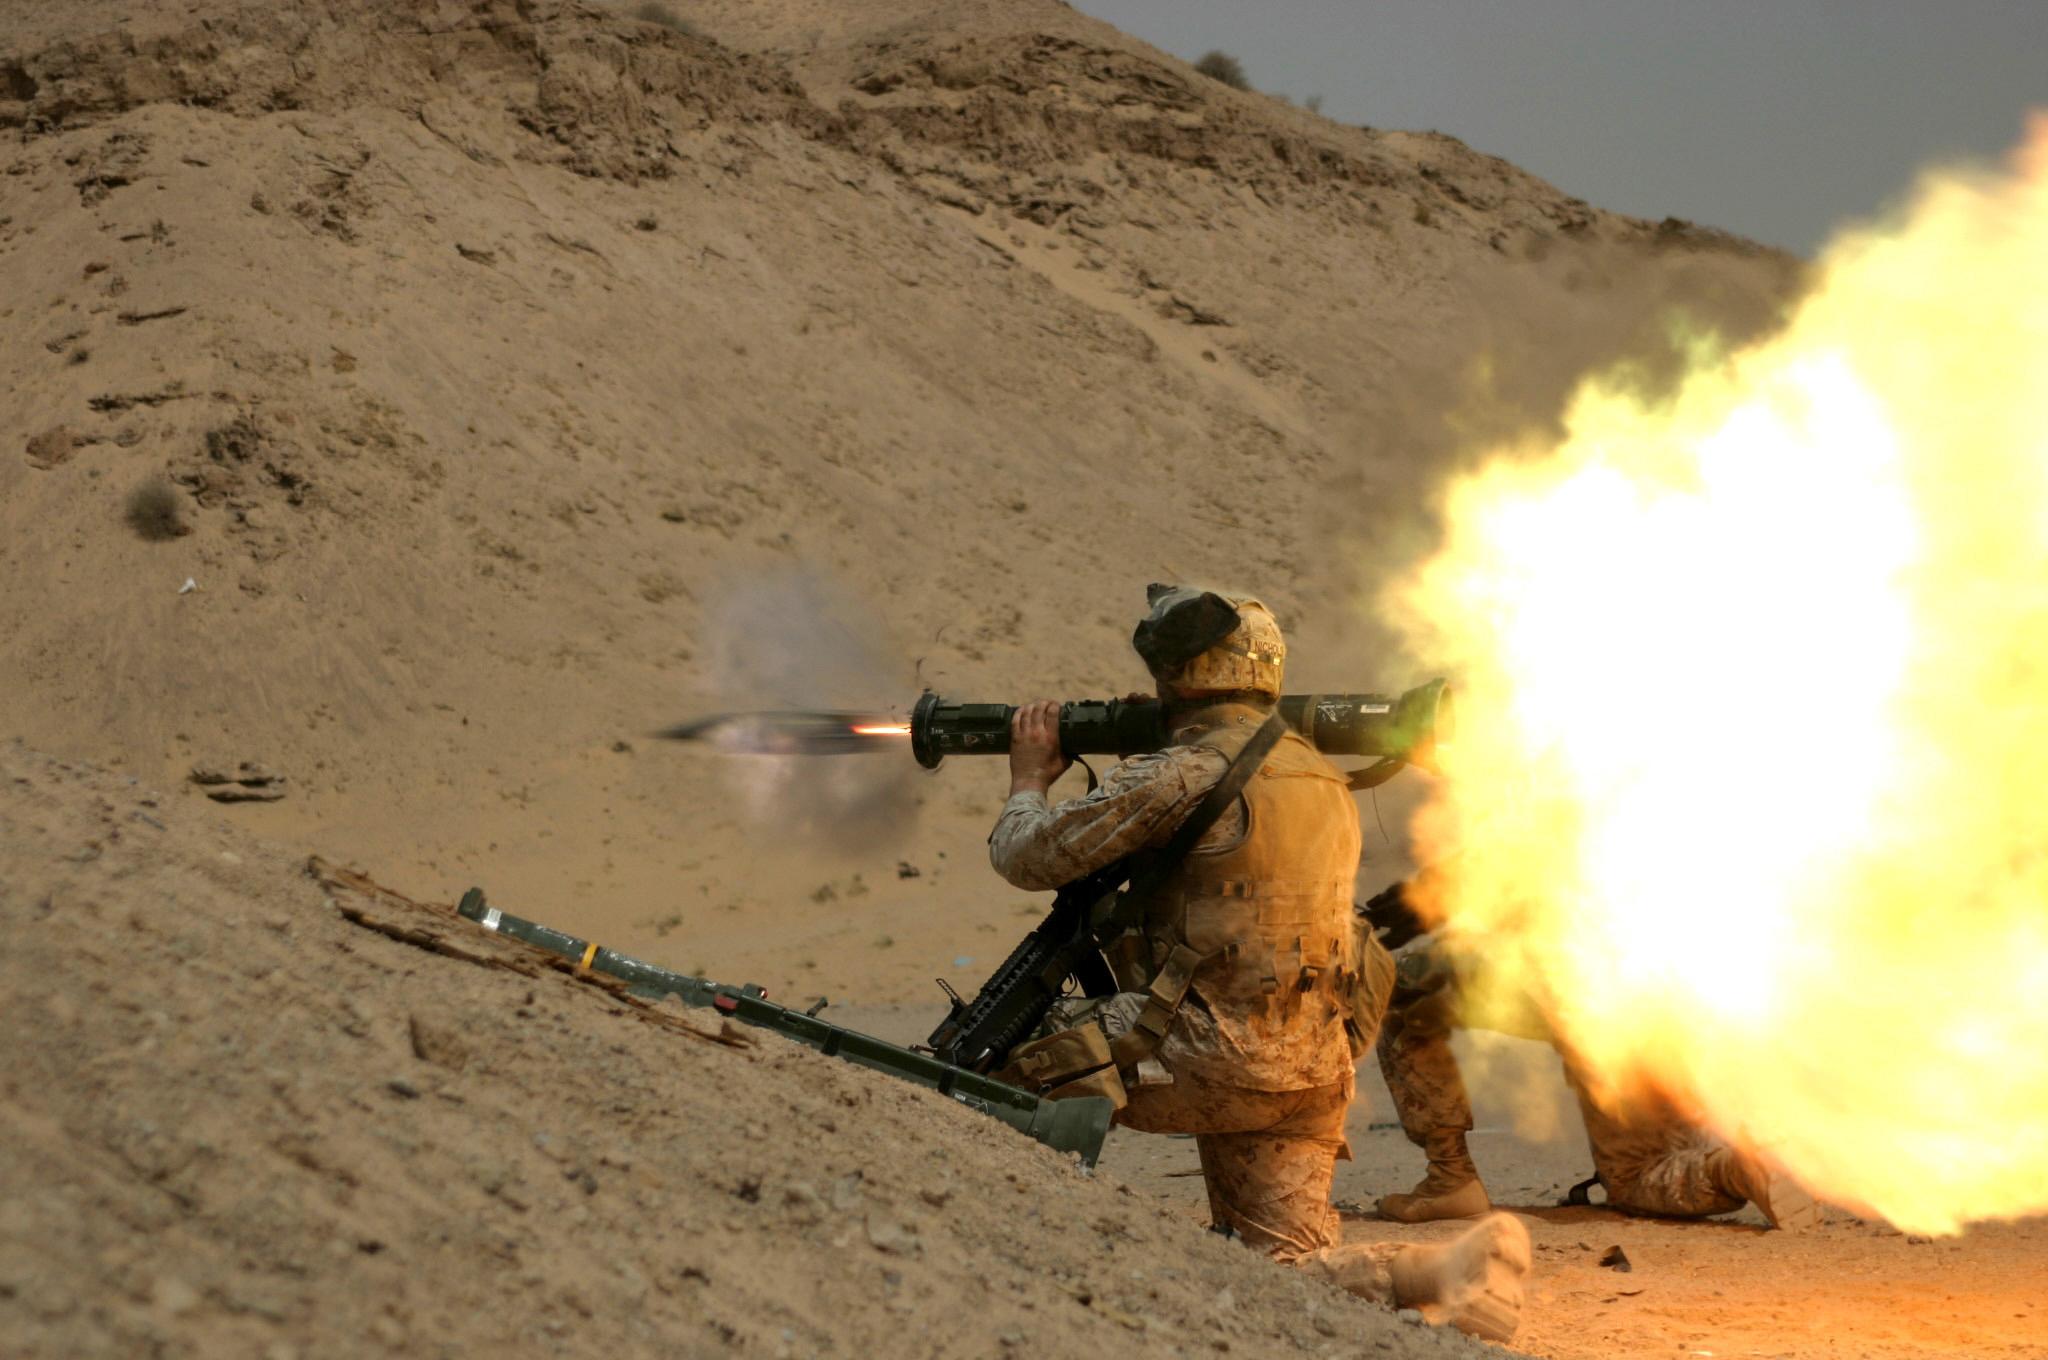 Firing AT-4 light anti-armor weapon